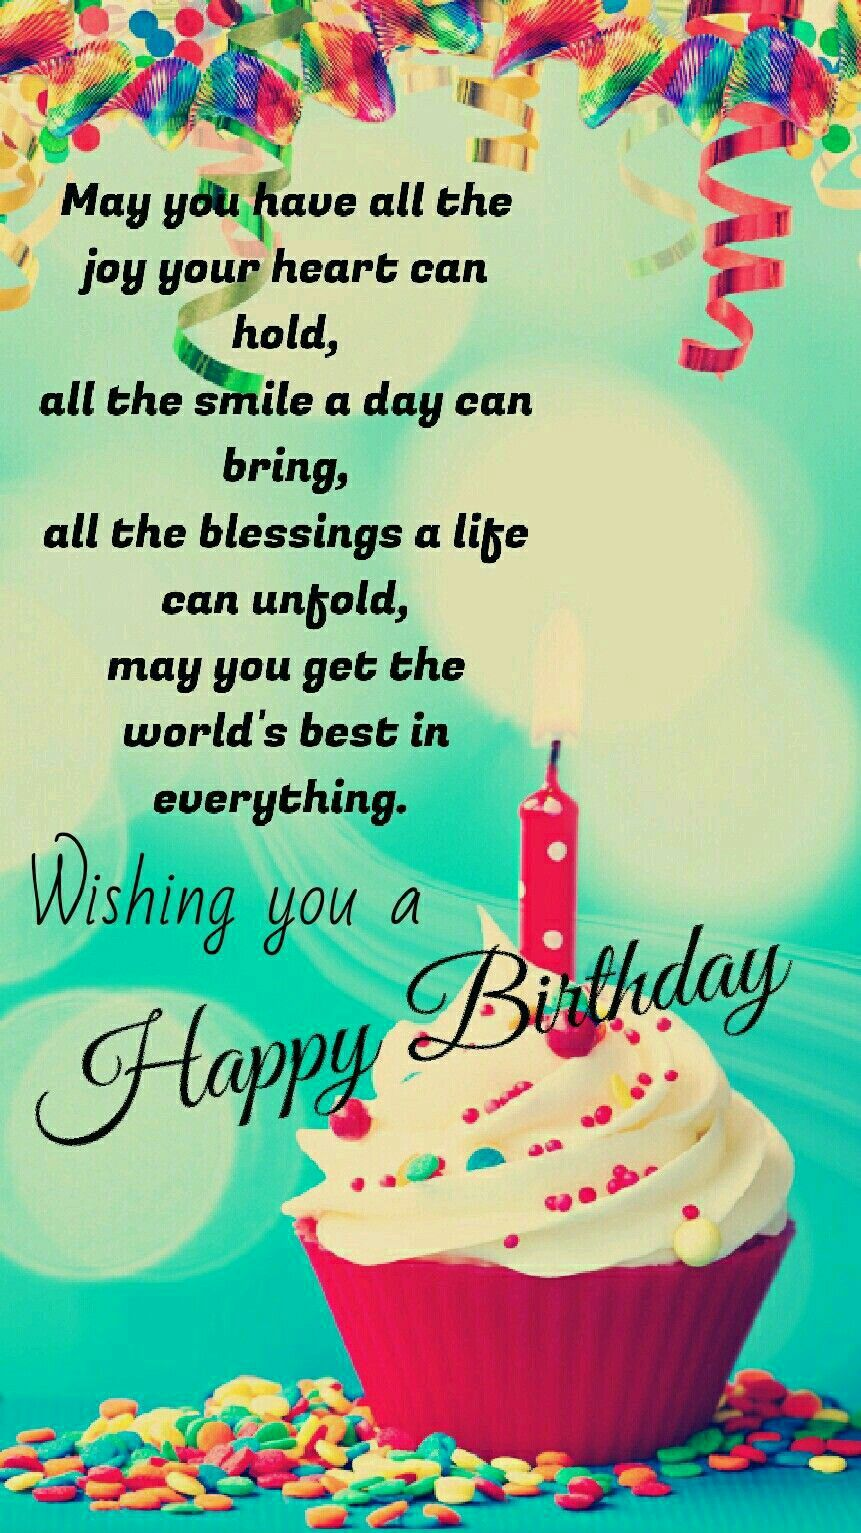 Idea by Savitree Persaud on Happy Birthday my creation